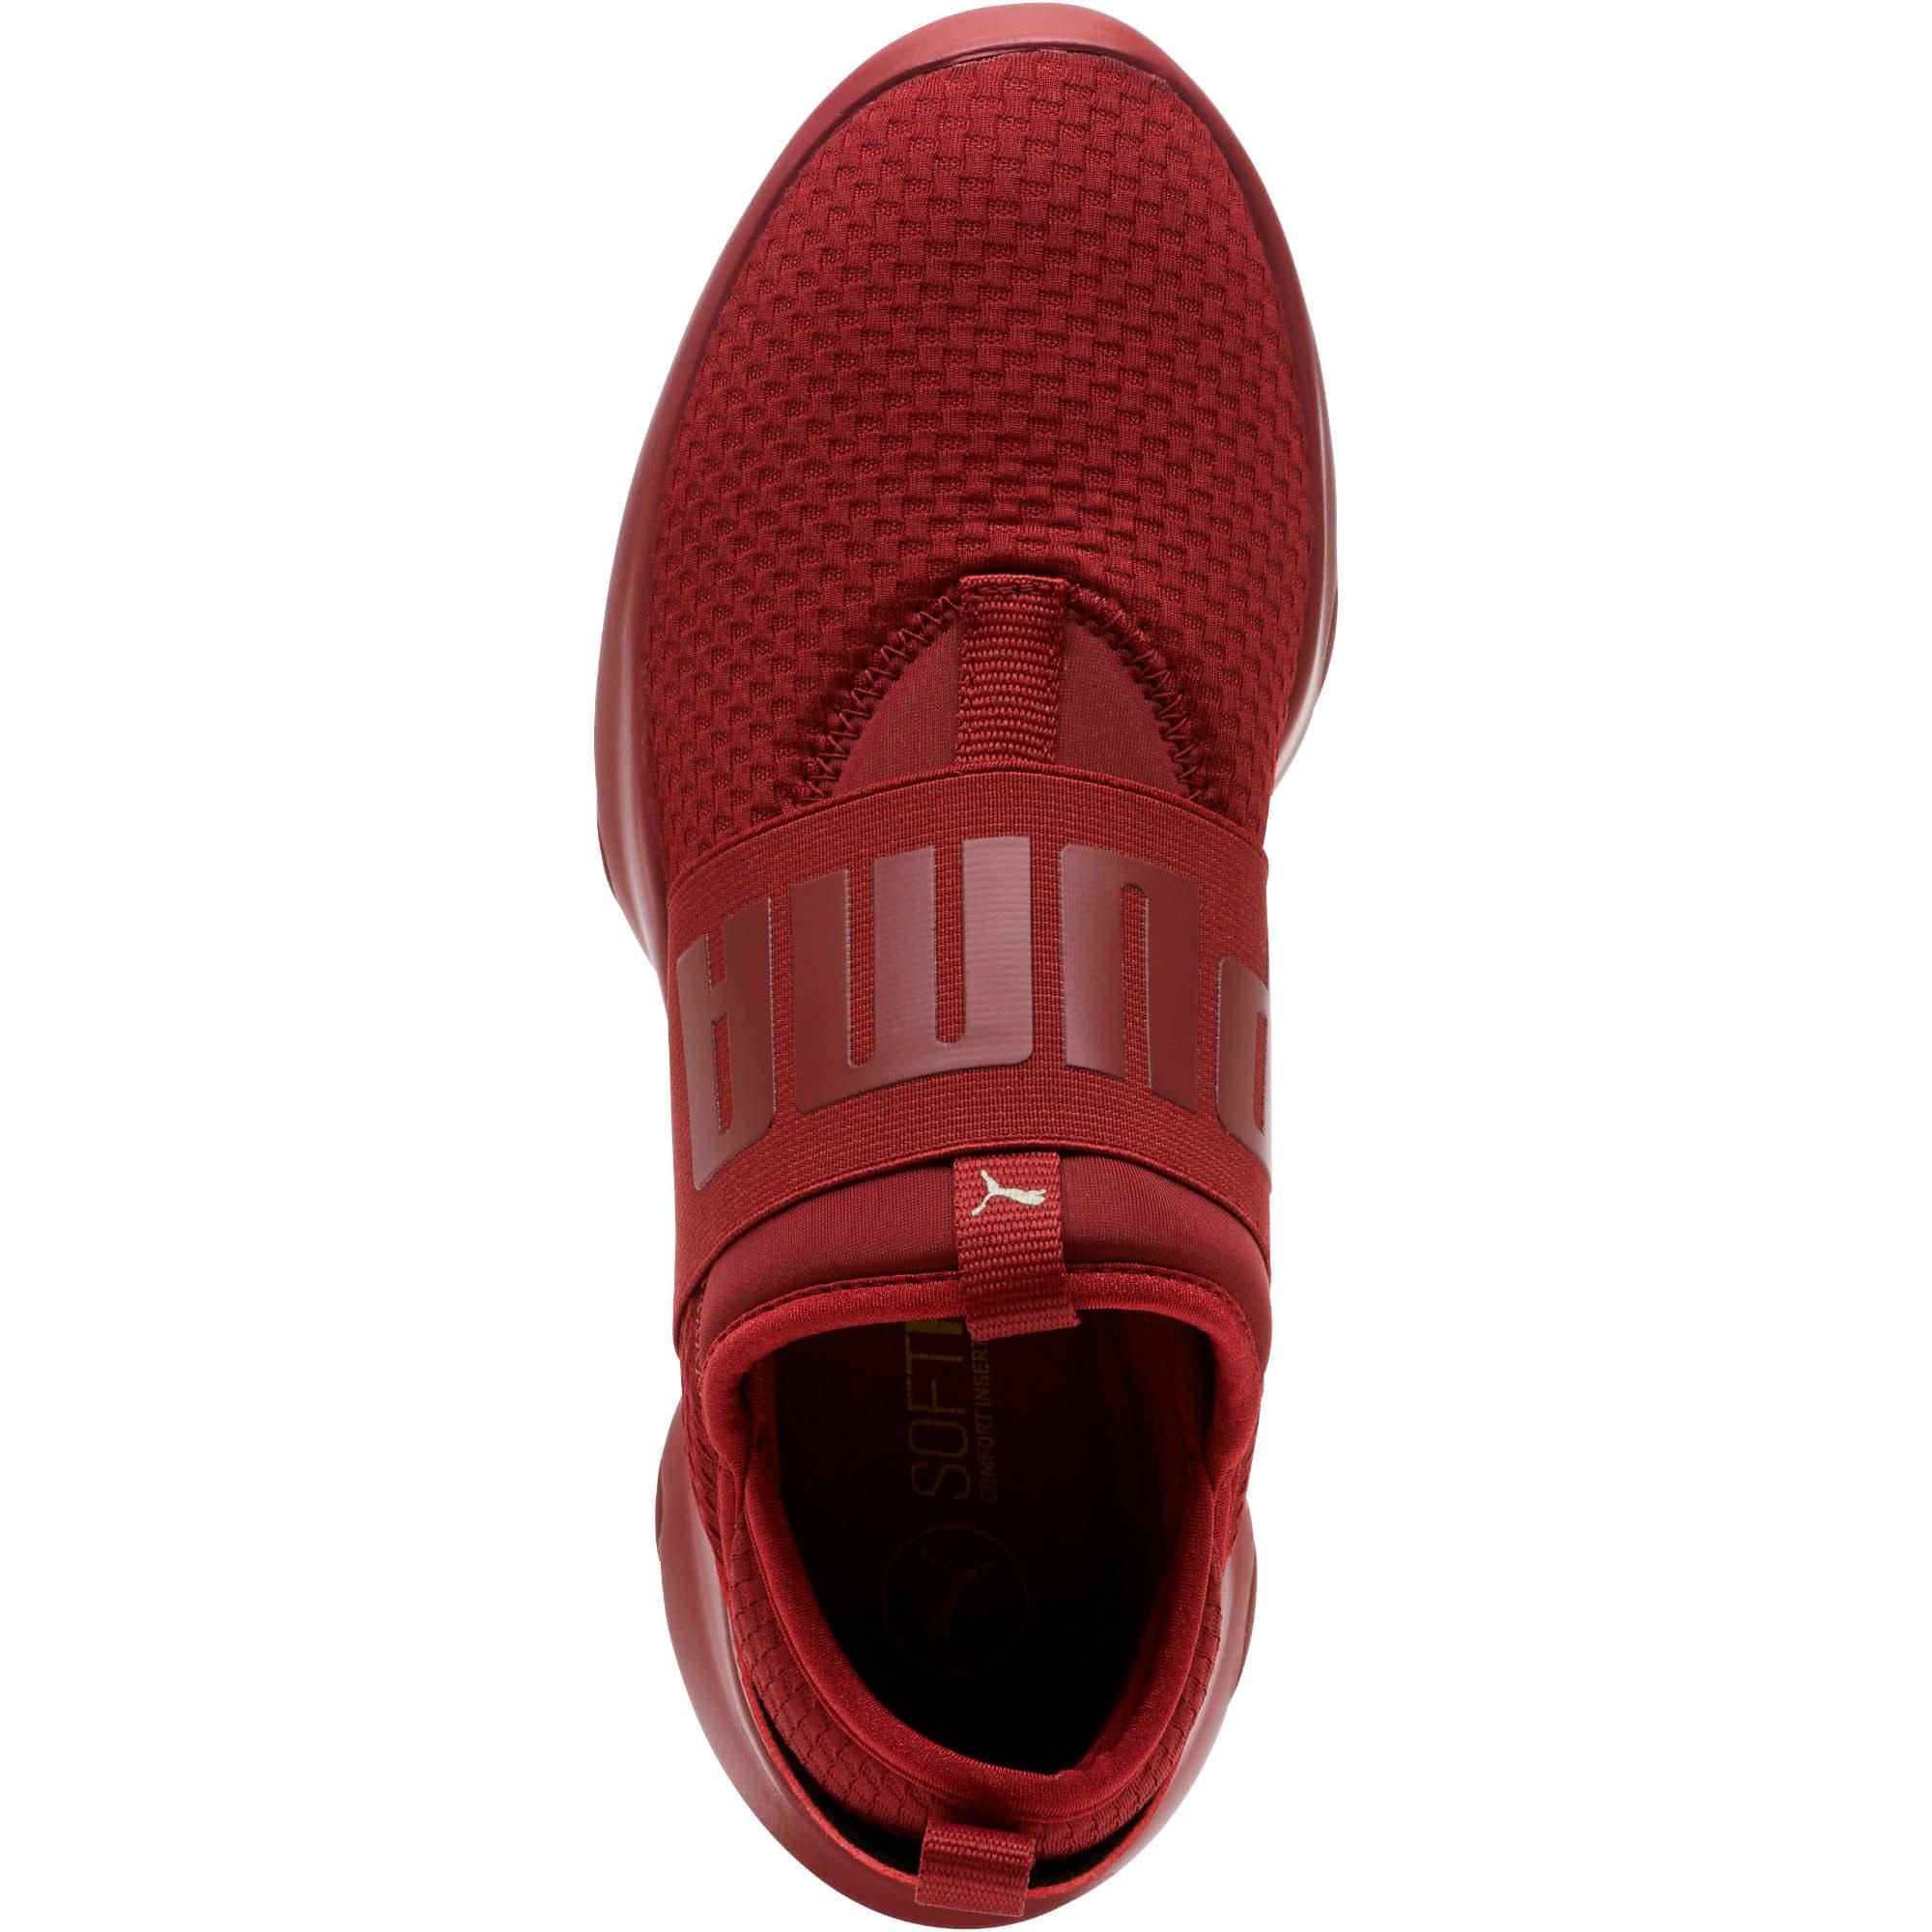 Thumbnail 5 of Dare En Pointe Women's Shoes, Pomegranate-Metallic Gold, medium